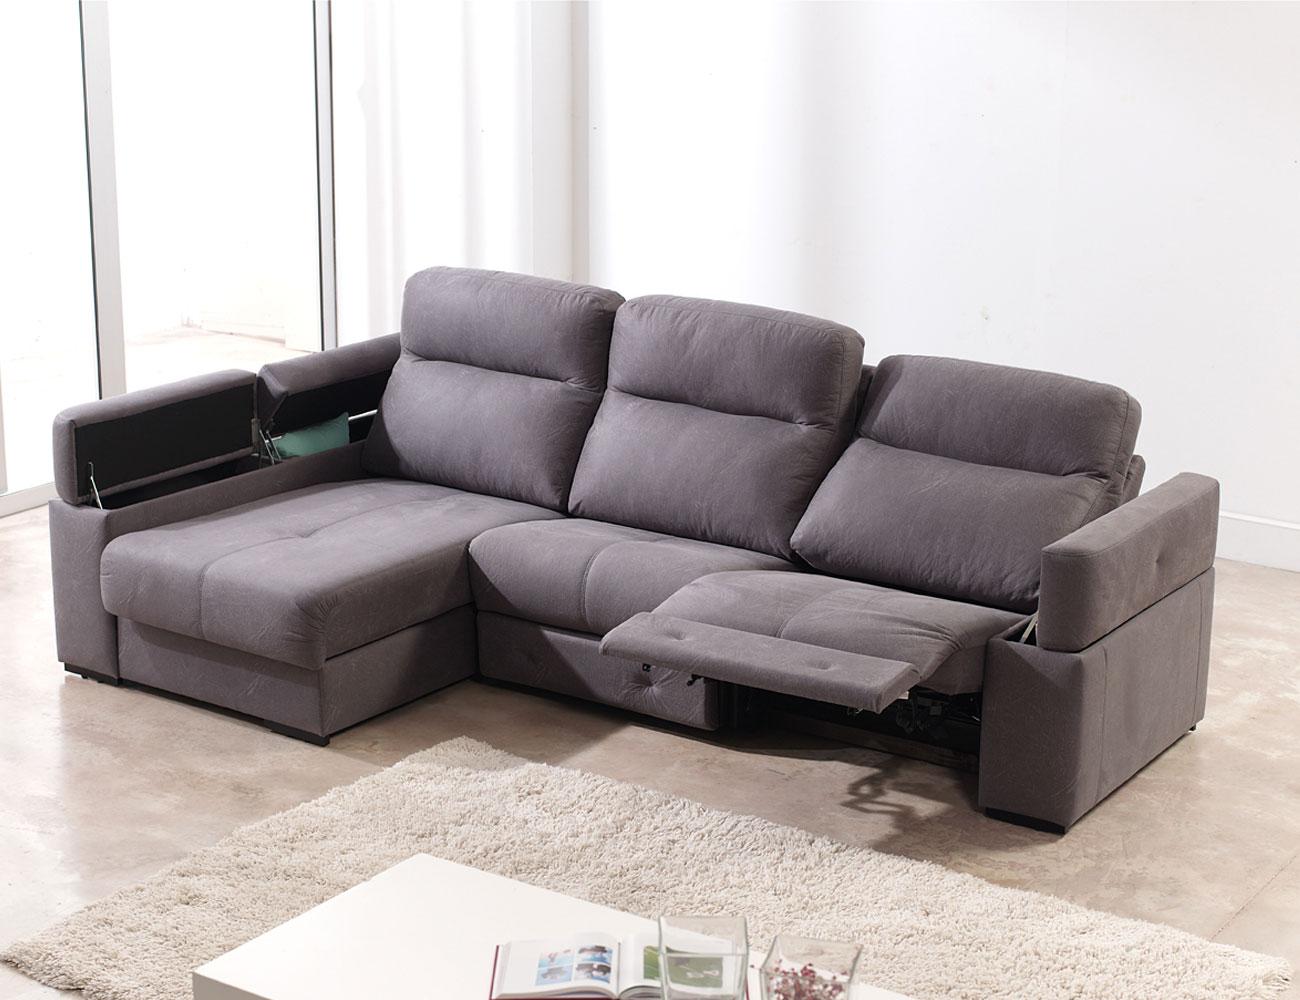 Sofa chaiselongue relax motor electrico 3 arcon 111